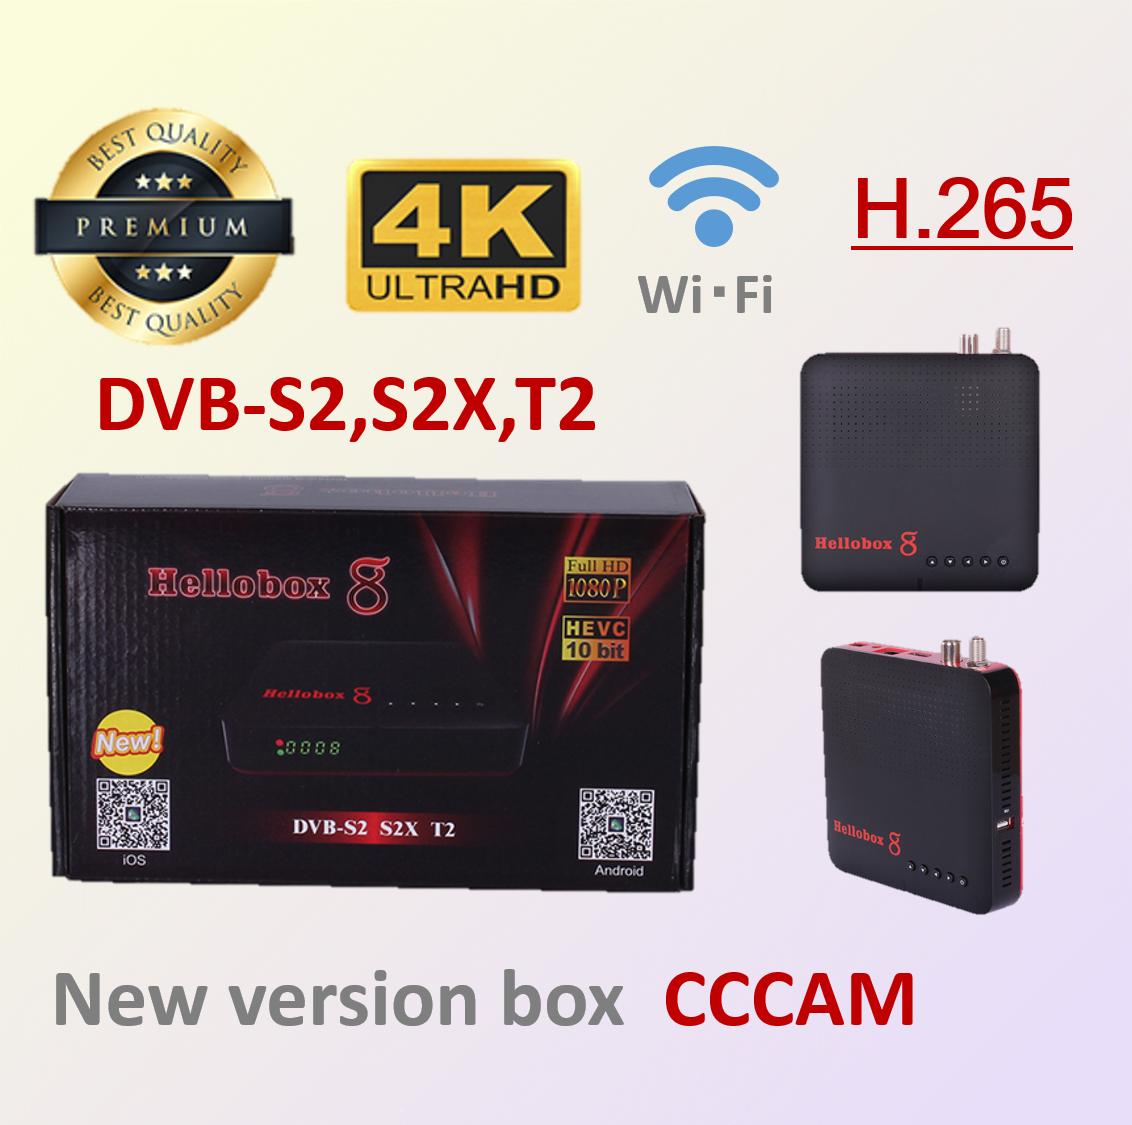 Hellobox 8 Satellite TV Receiver DVB-T2 / S2 / S2X TV Tuner Support Mobile Phone Play Satellite TV Receiver Support Spain Brazil